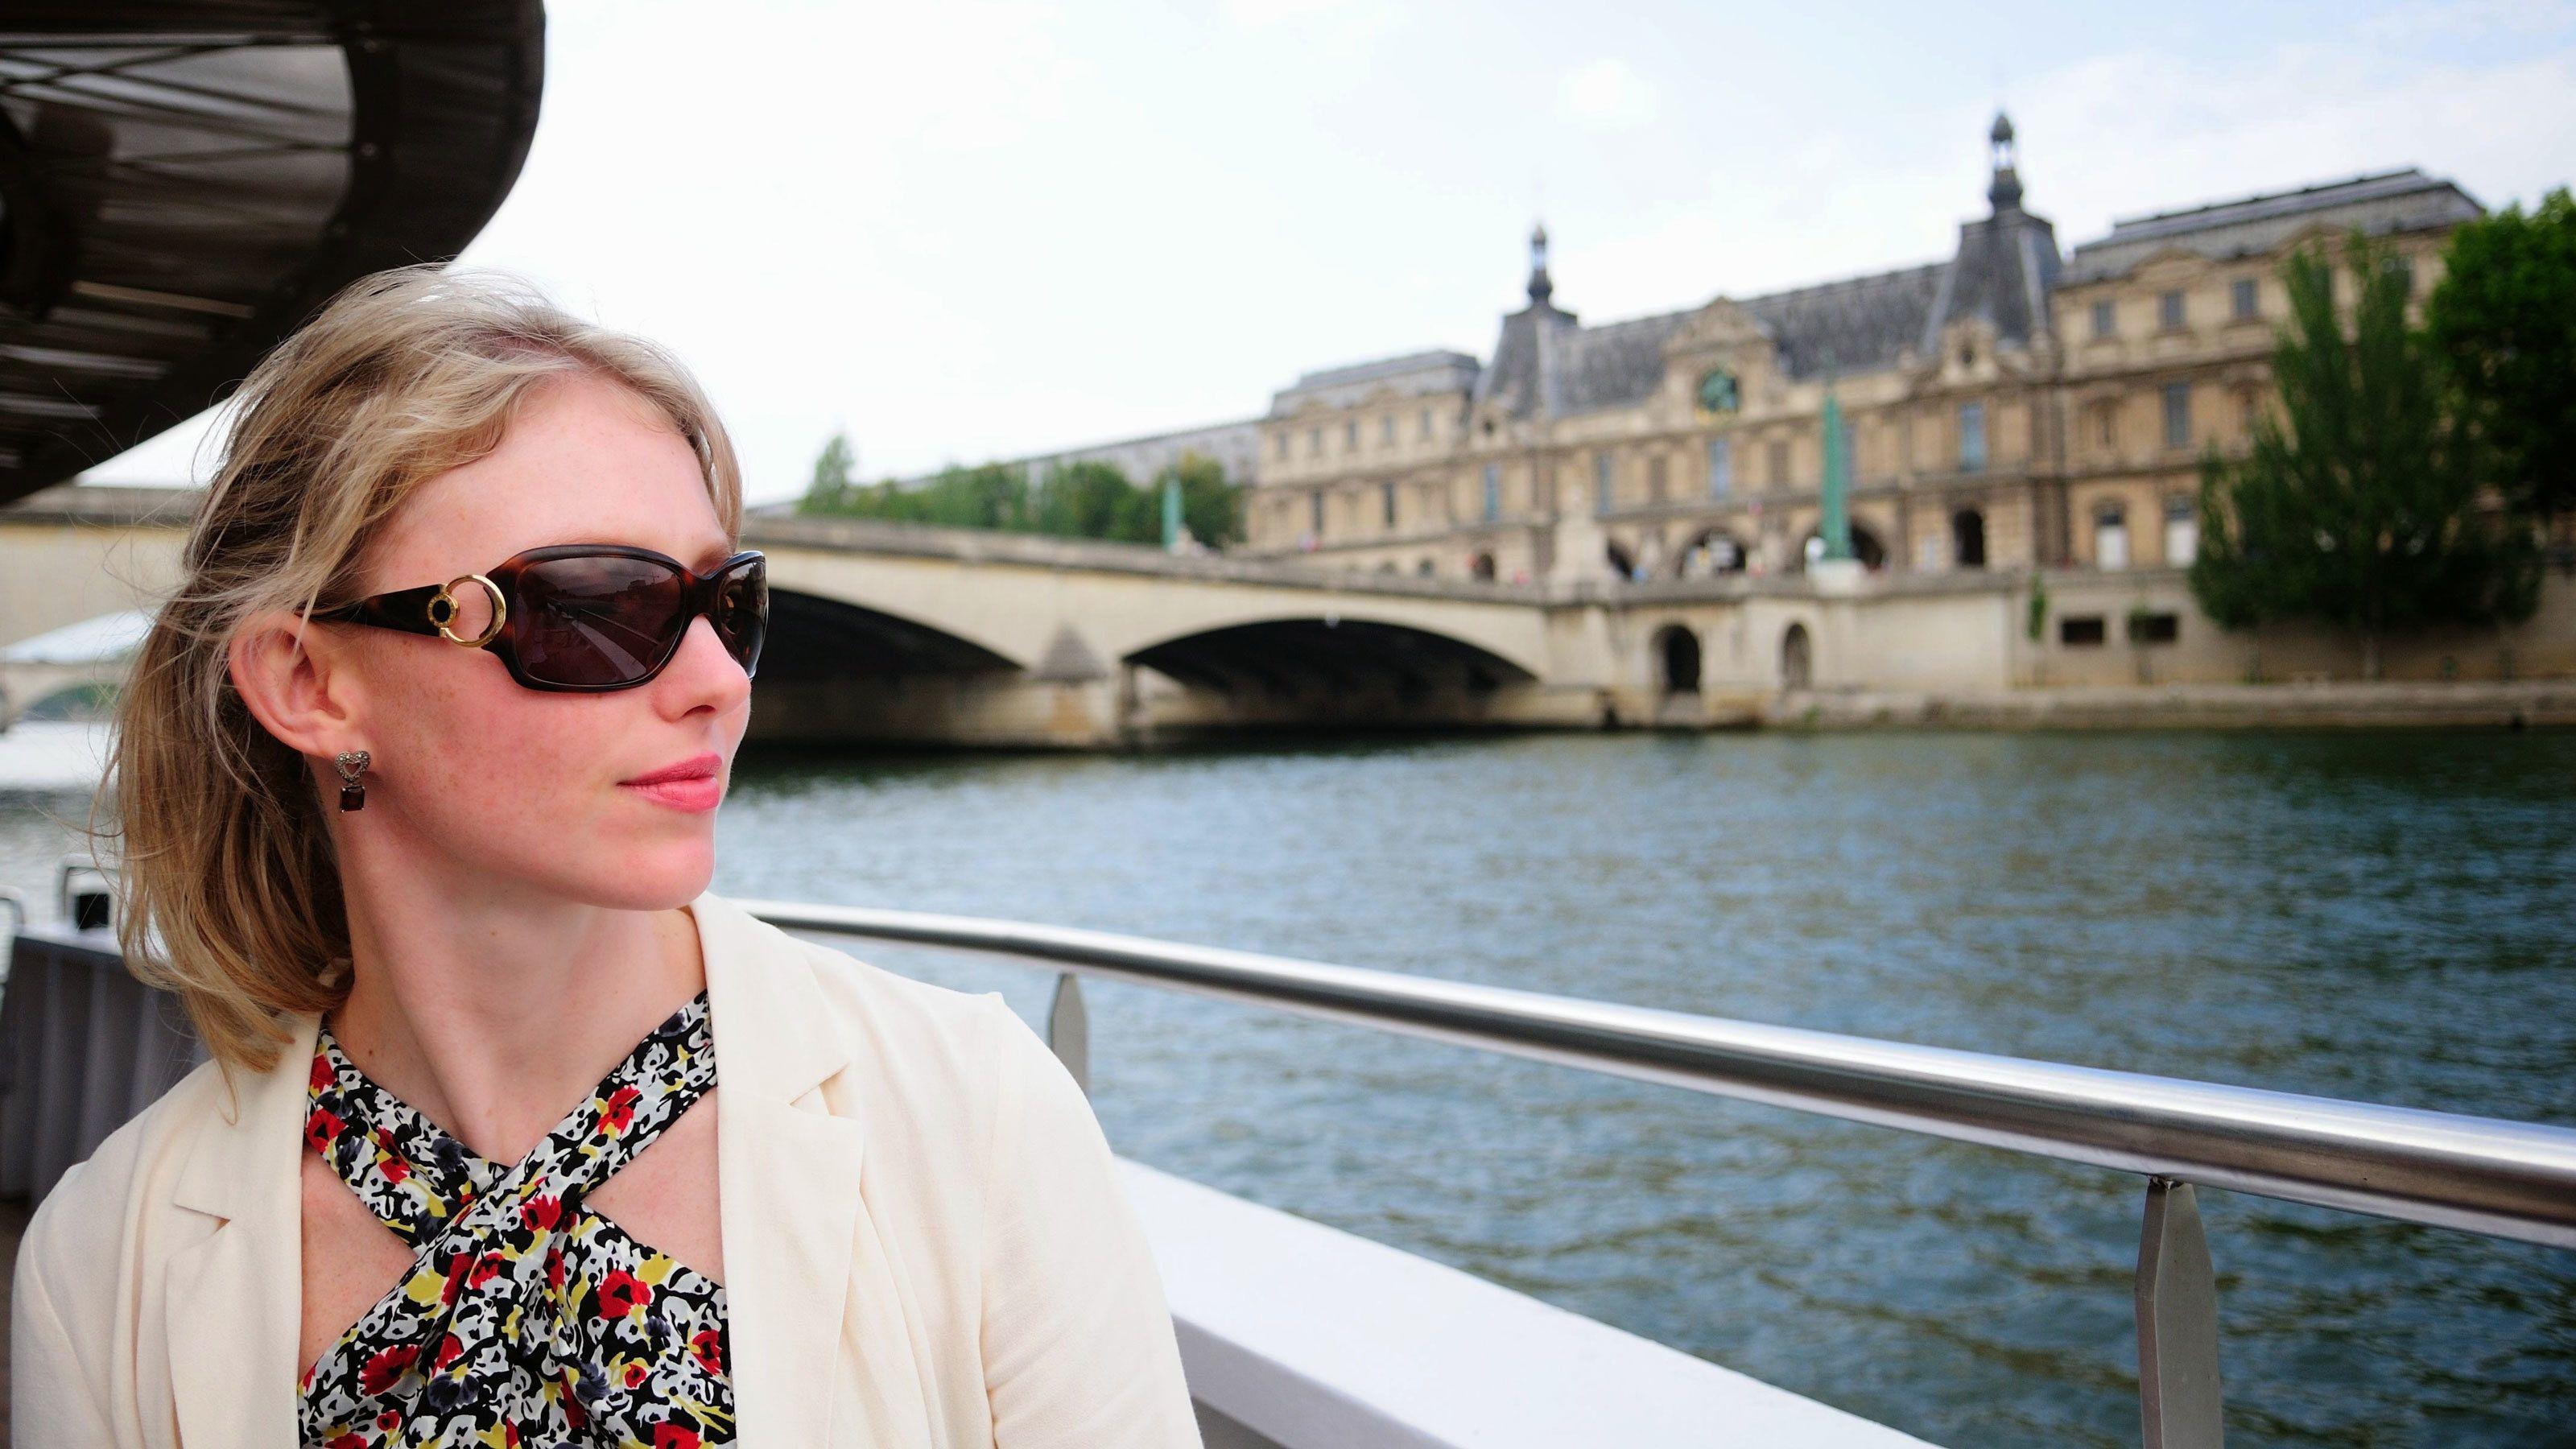 Aboard the river cruse in Paris